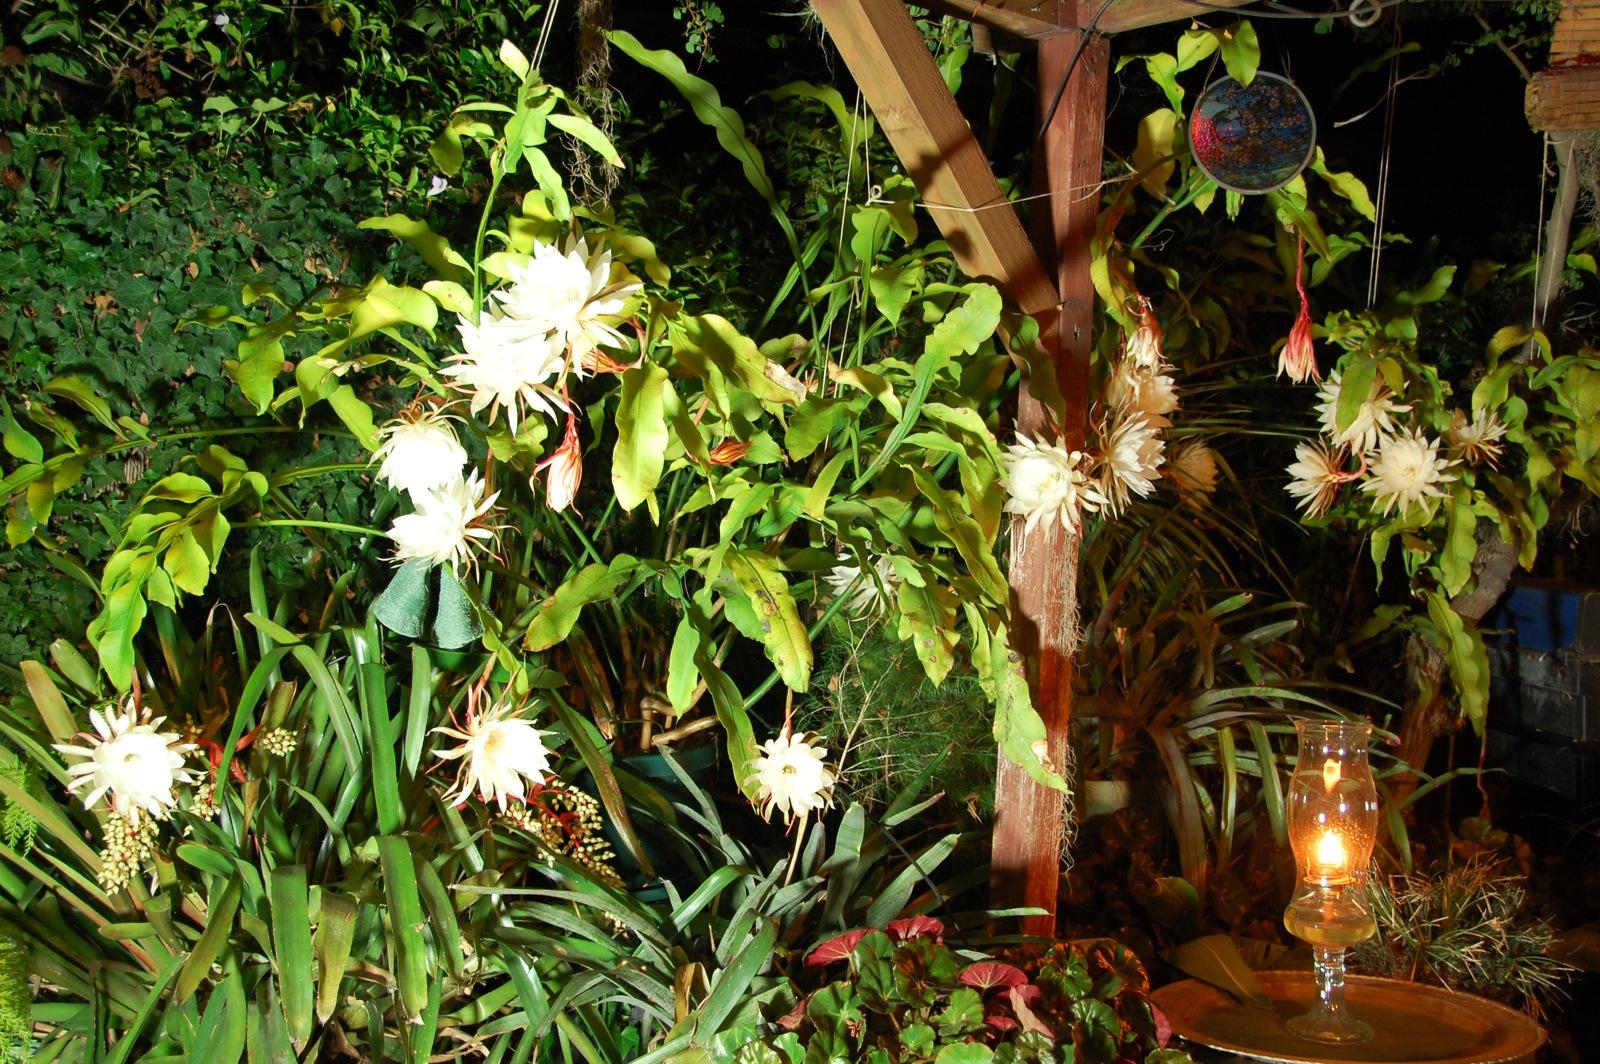 Click image for larger version  Name:1600 6:20:08 cereus bloom.jpg Views:53 Size:724.5 KB ID:62732